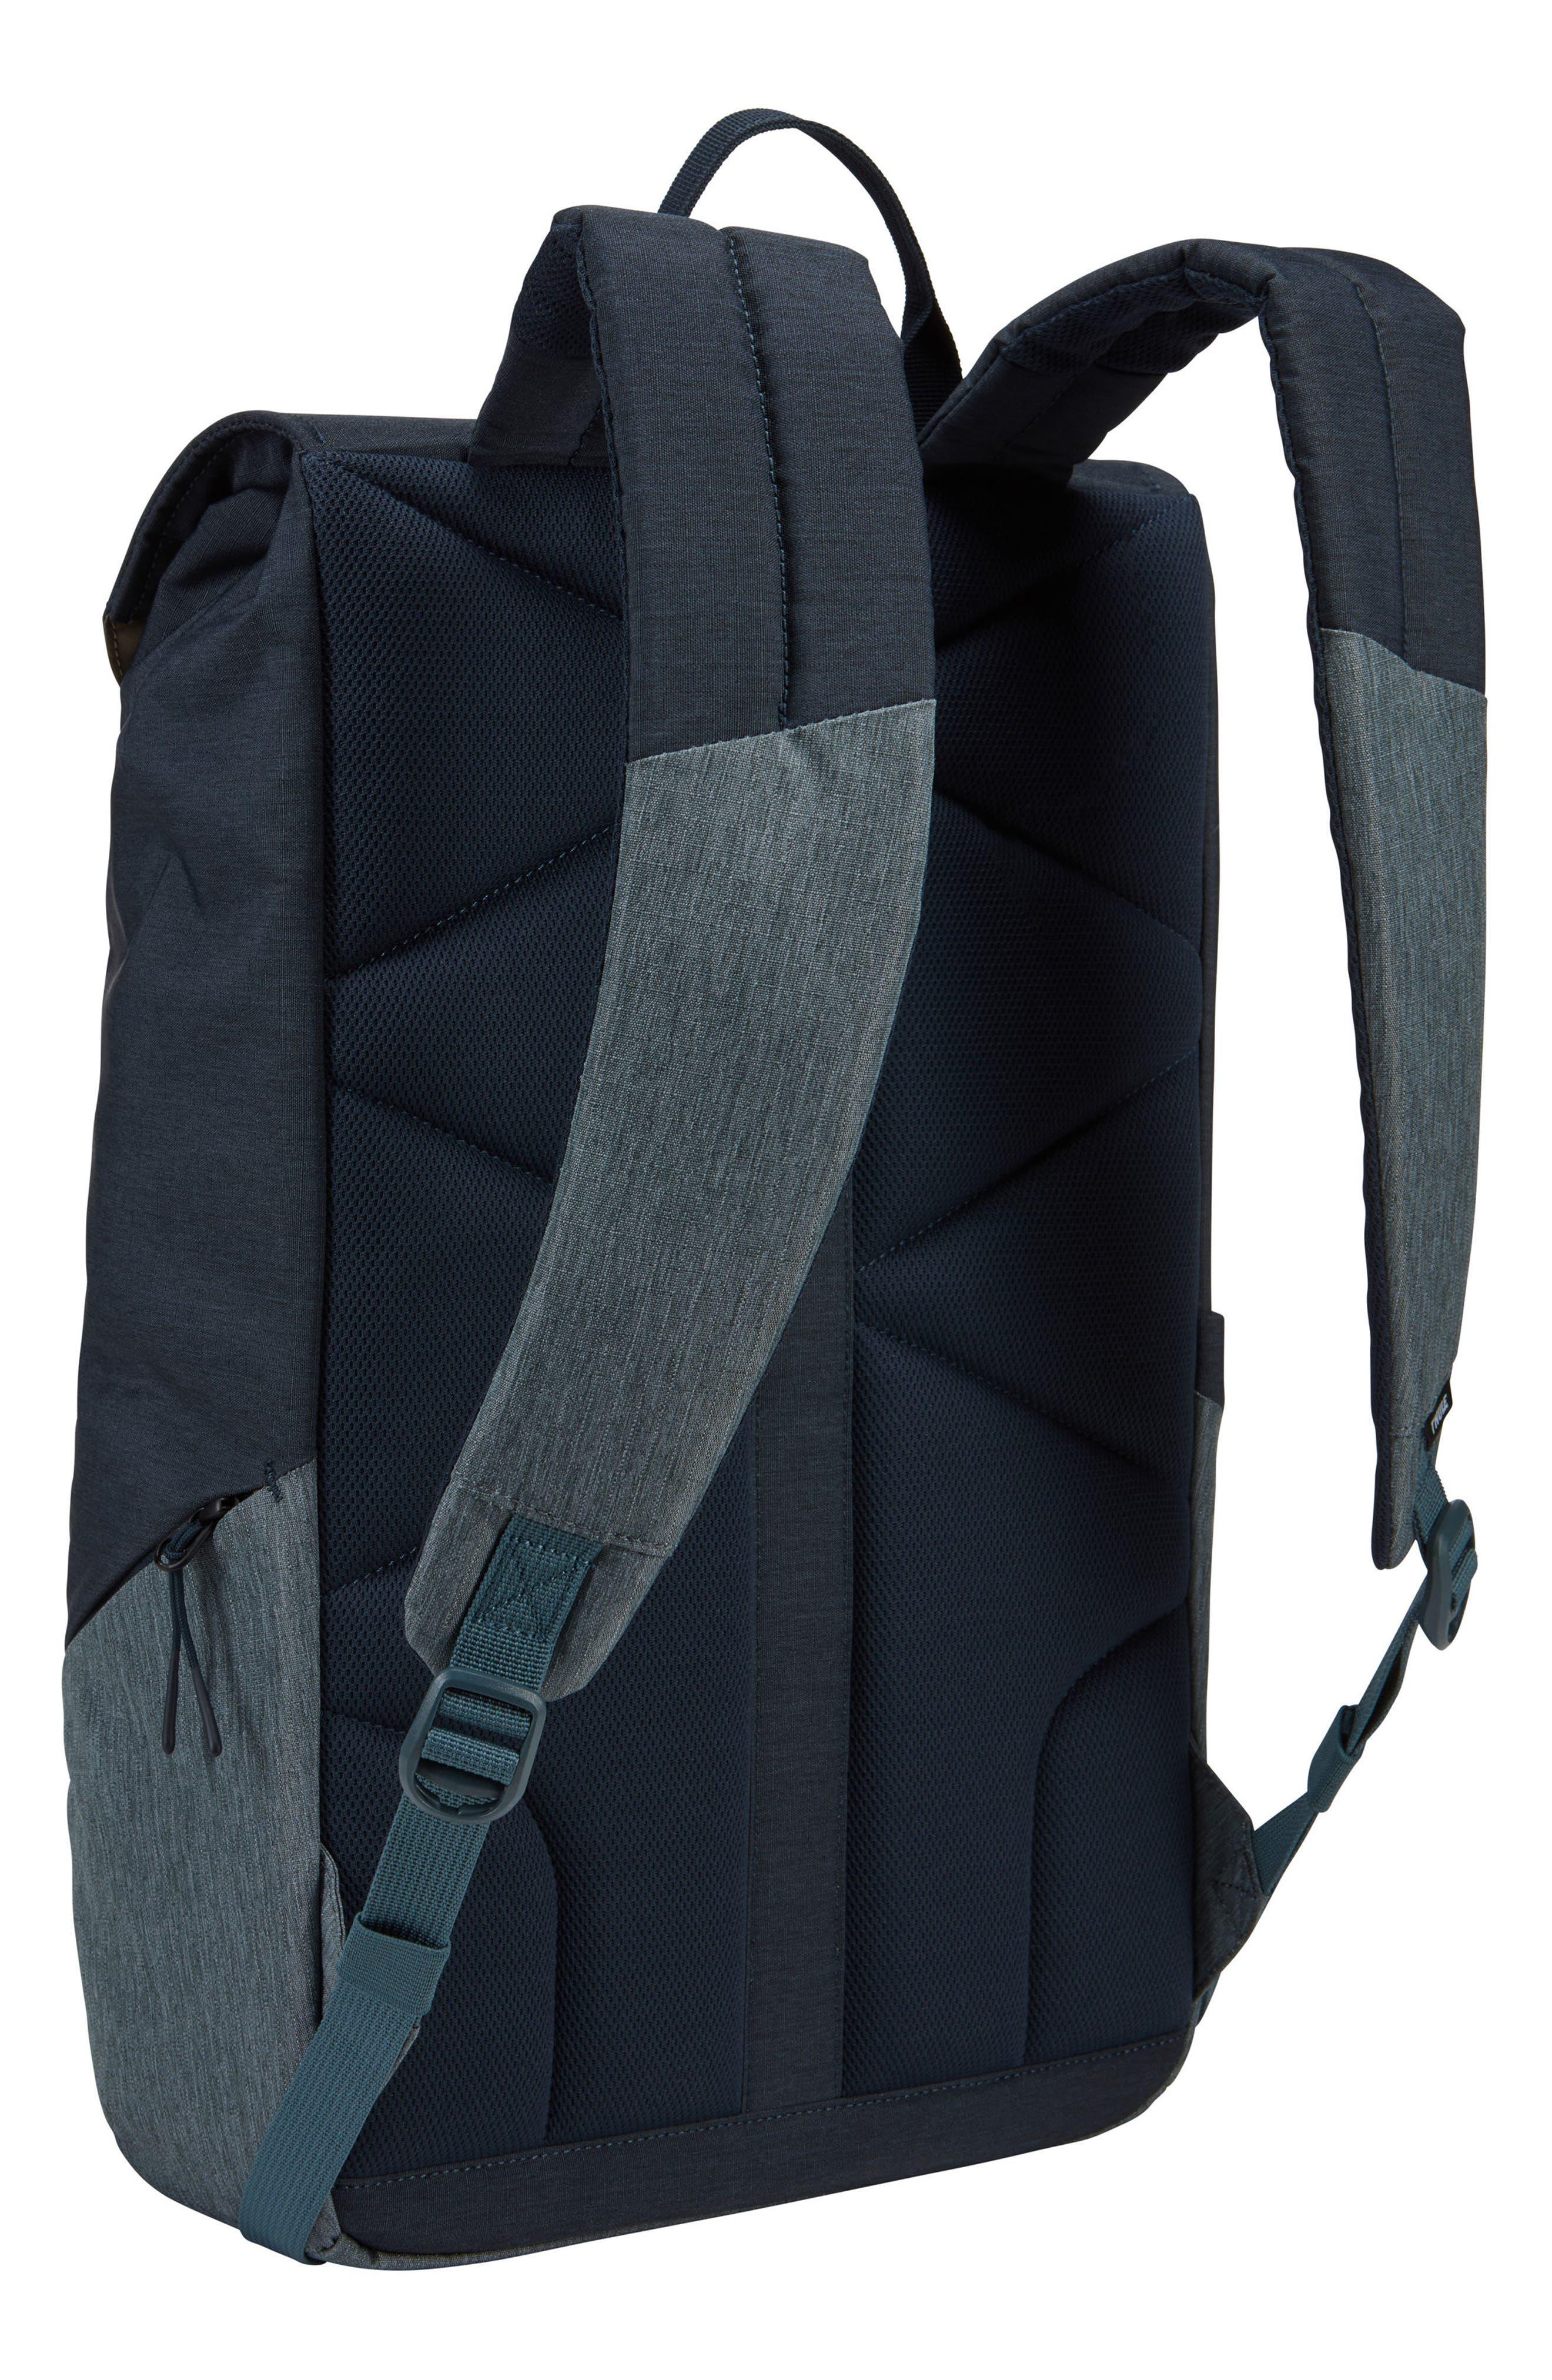 Lithos Backpack,                             Alternate thumbnail 2, color,                             Carbon Blue